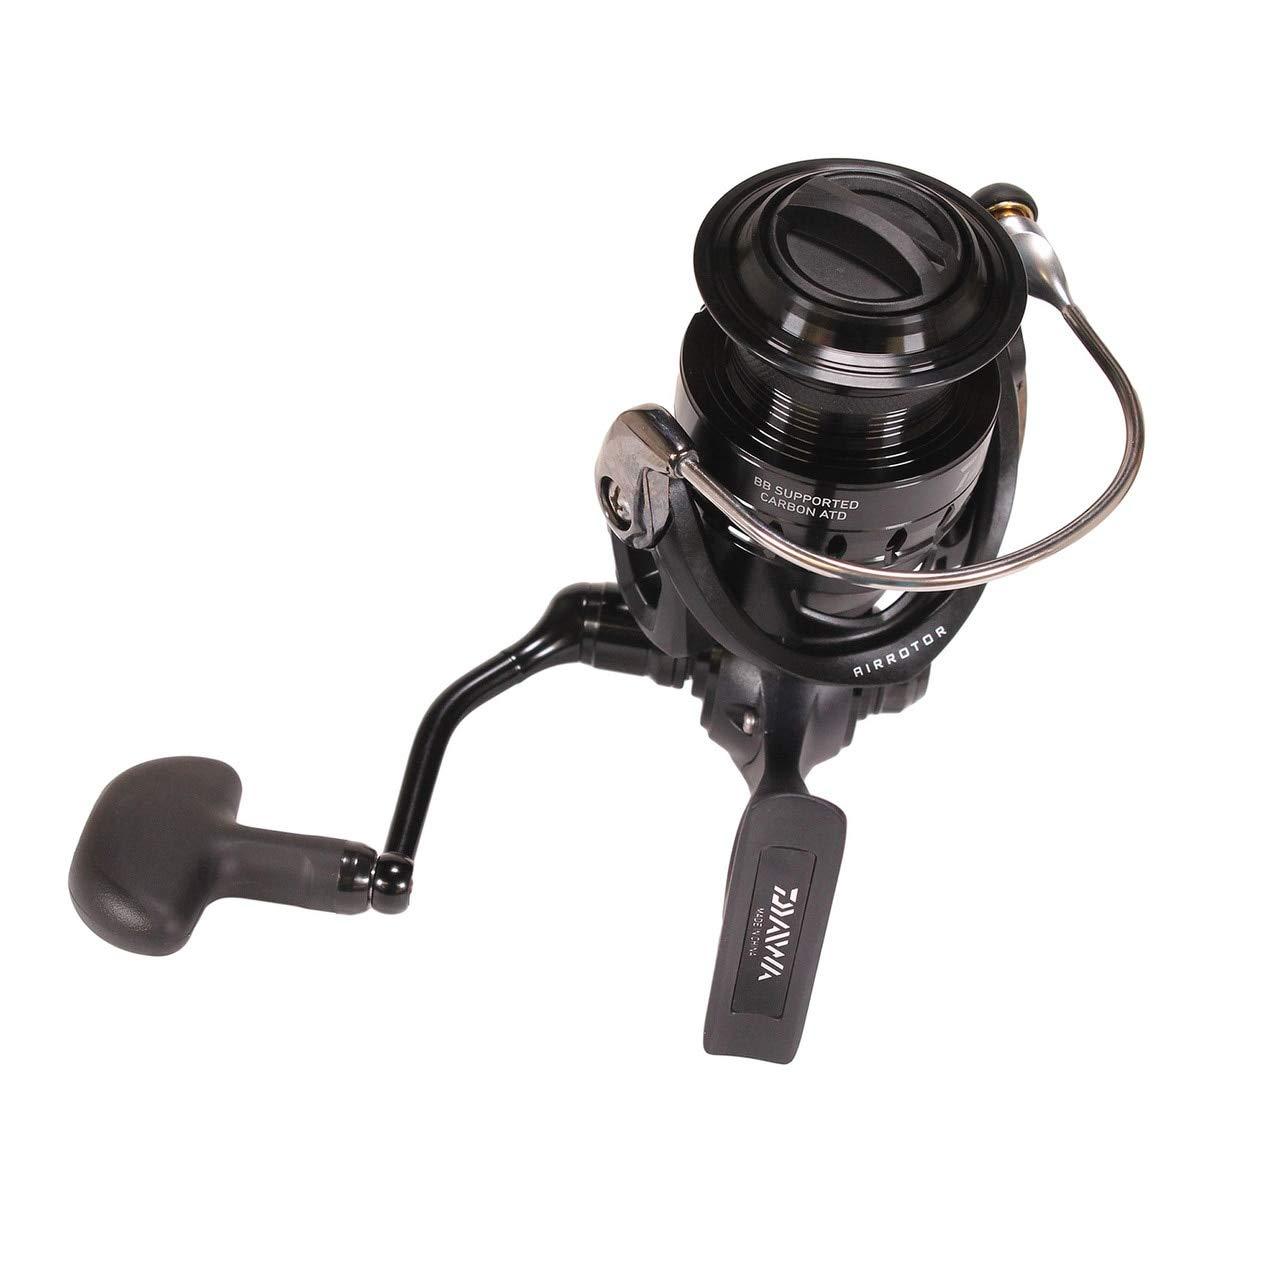 Daiwa Saltist Back Bay 4000 LT Light Saltwater Spinning Fishing Reel STTBB4000LT